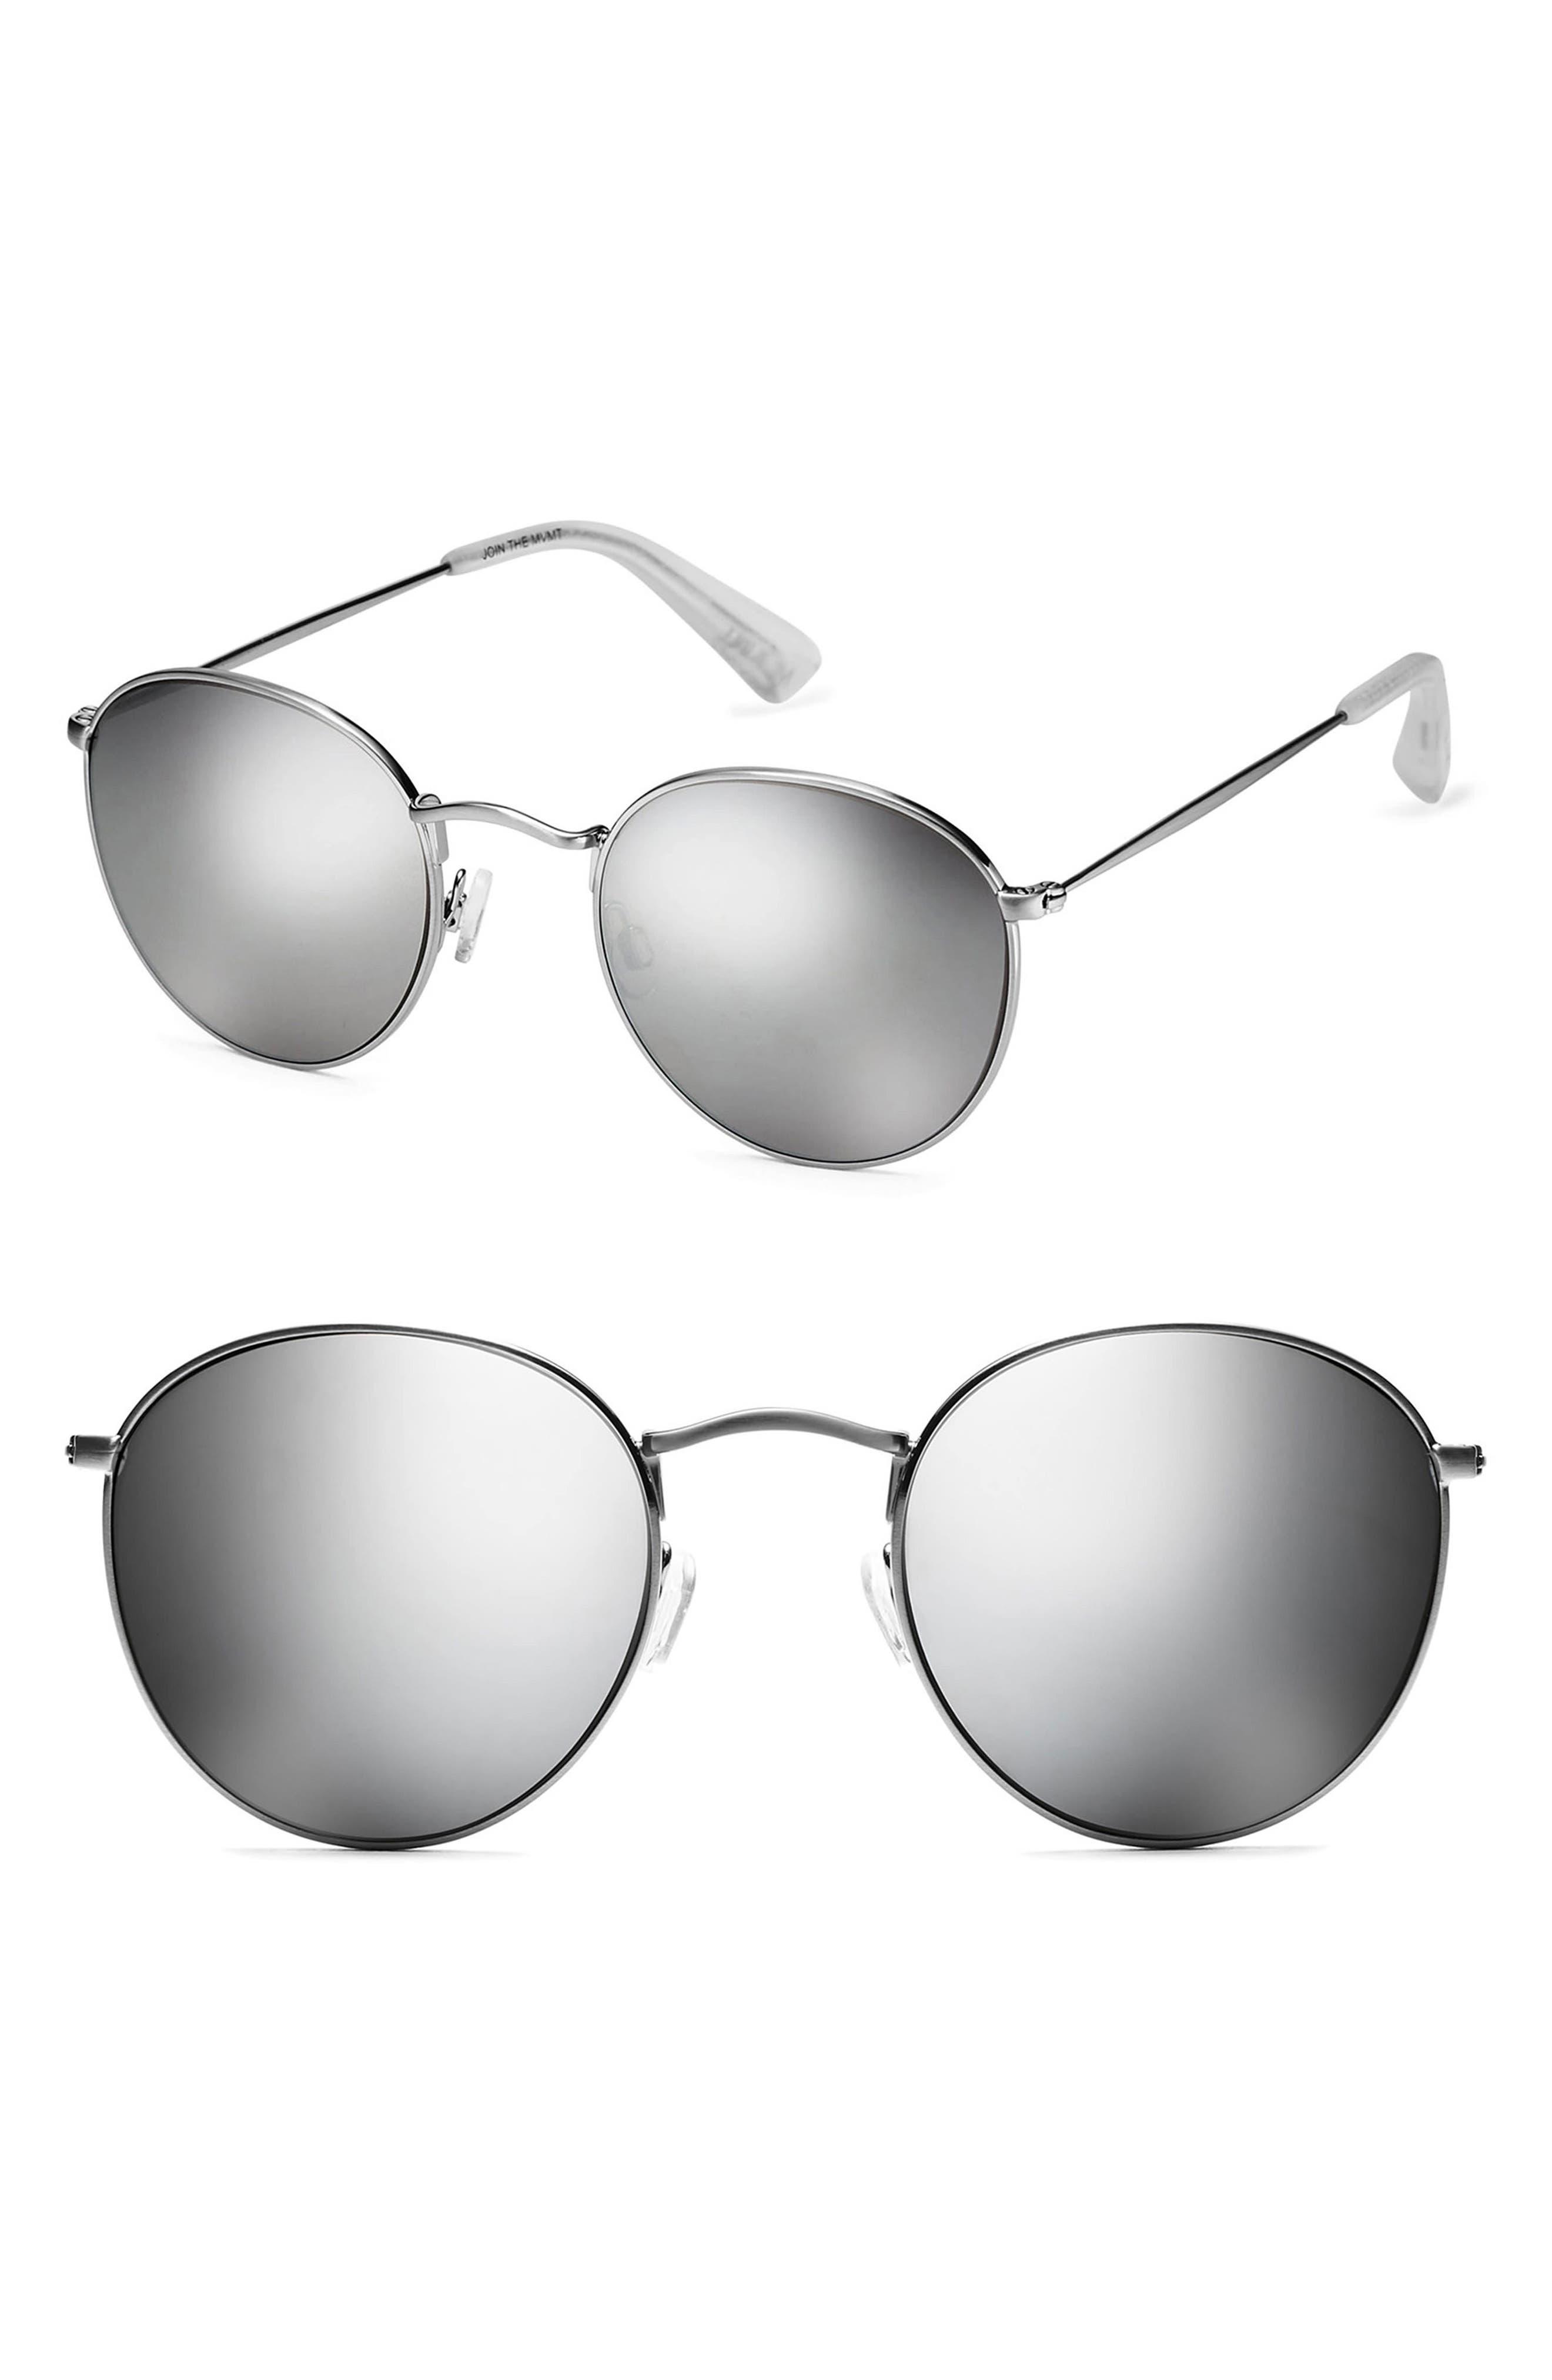 Icon 50mm Polarized Wire Sunglasses,                             Main thumbnail 1, color,                             SILVER MIRROR